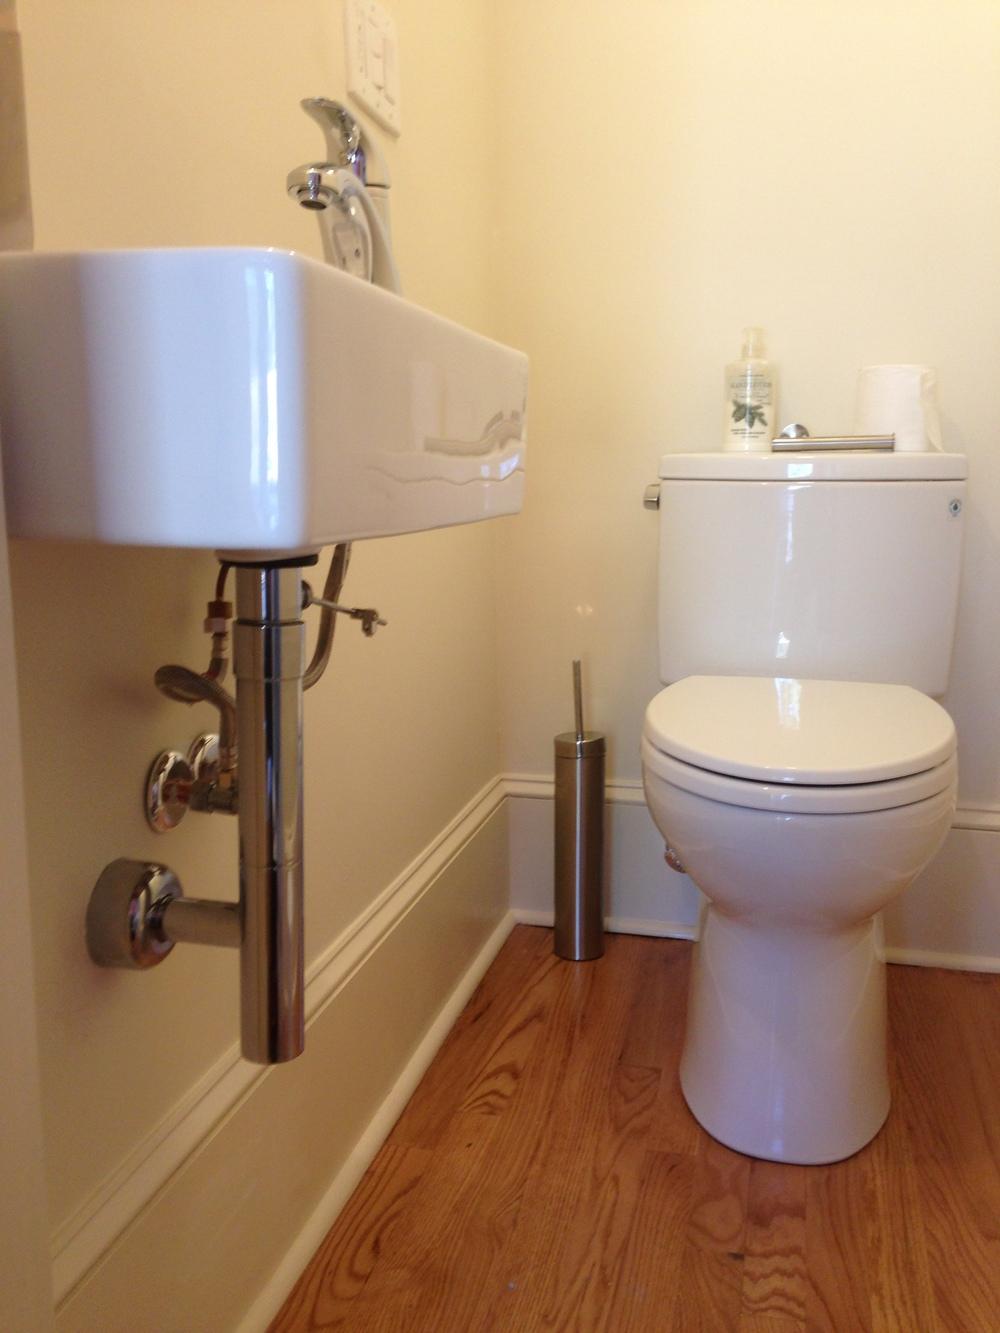 cvisions_bathroom_remodel14.JPG